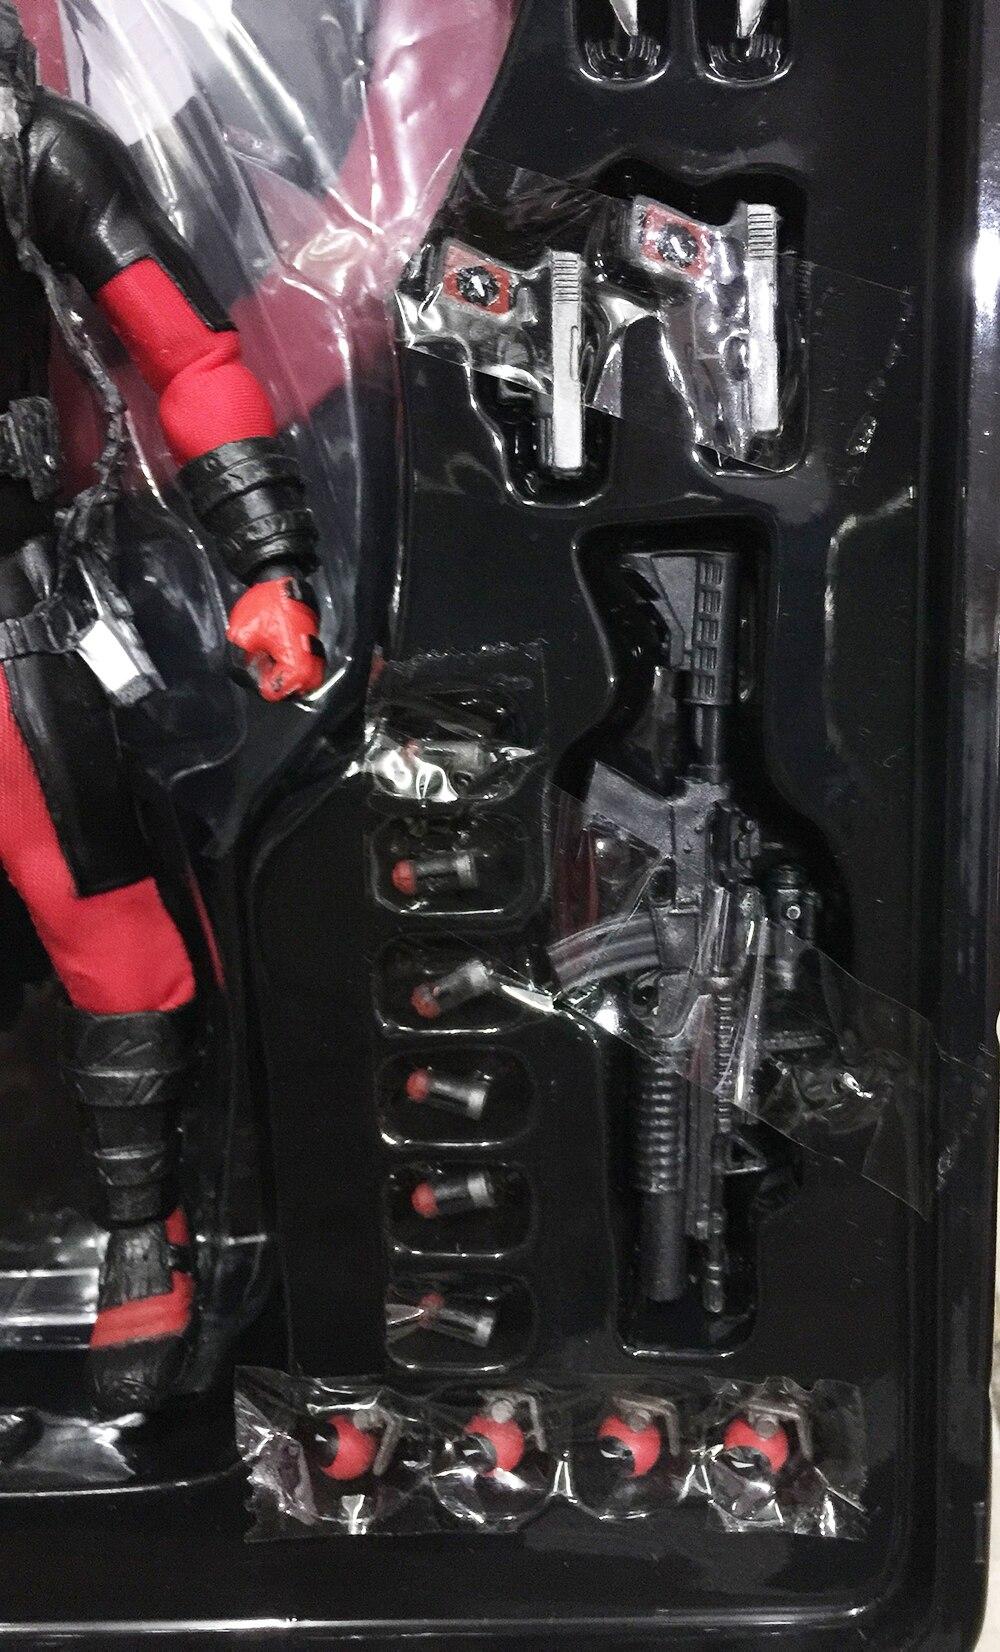 Marvel Super Hero Deadpool X-Men Mezco One 12 Action Figures Toys  (9)